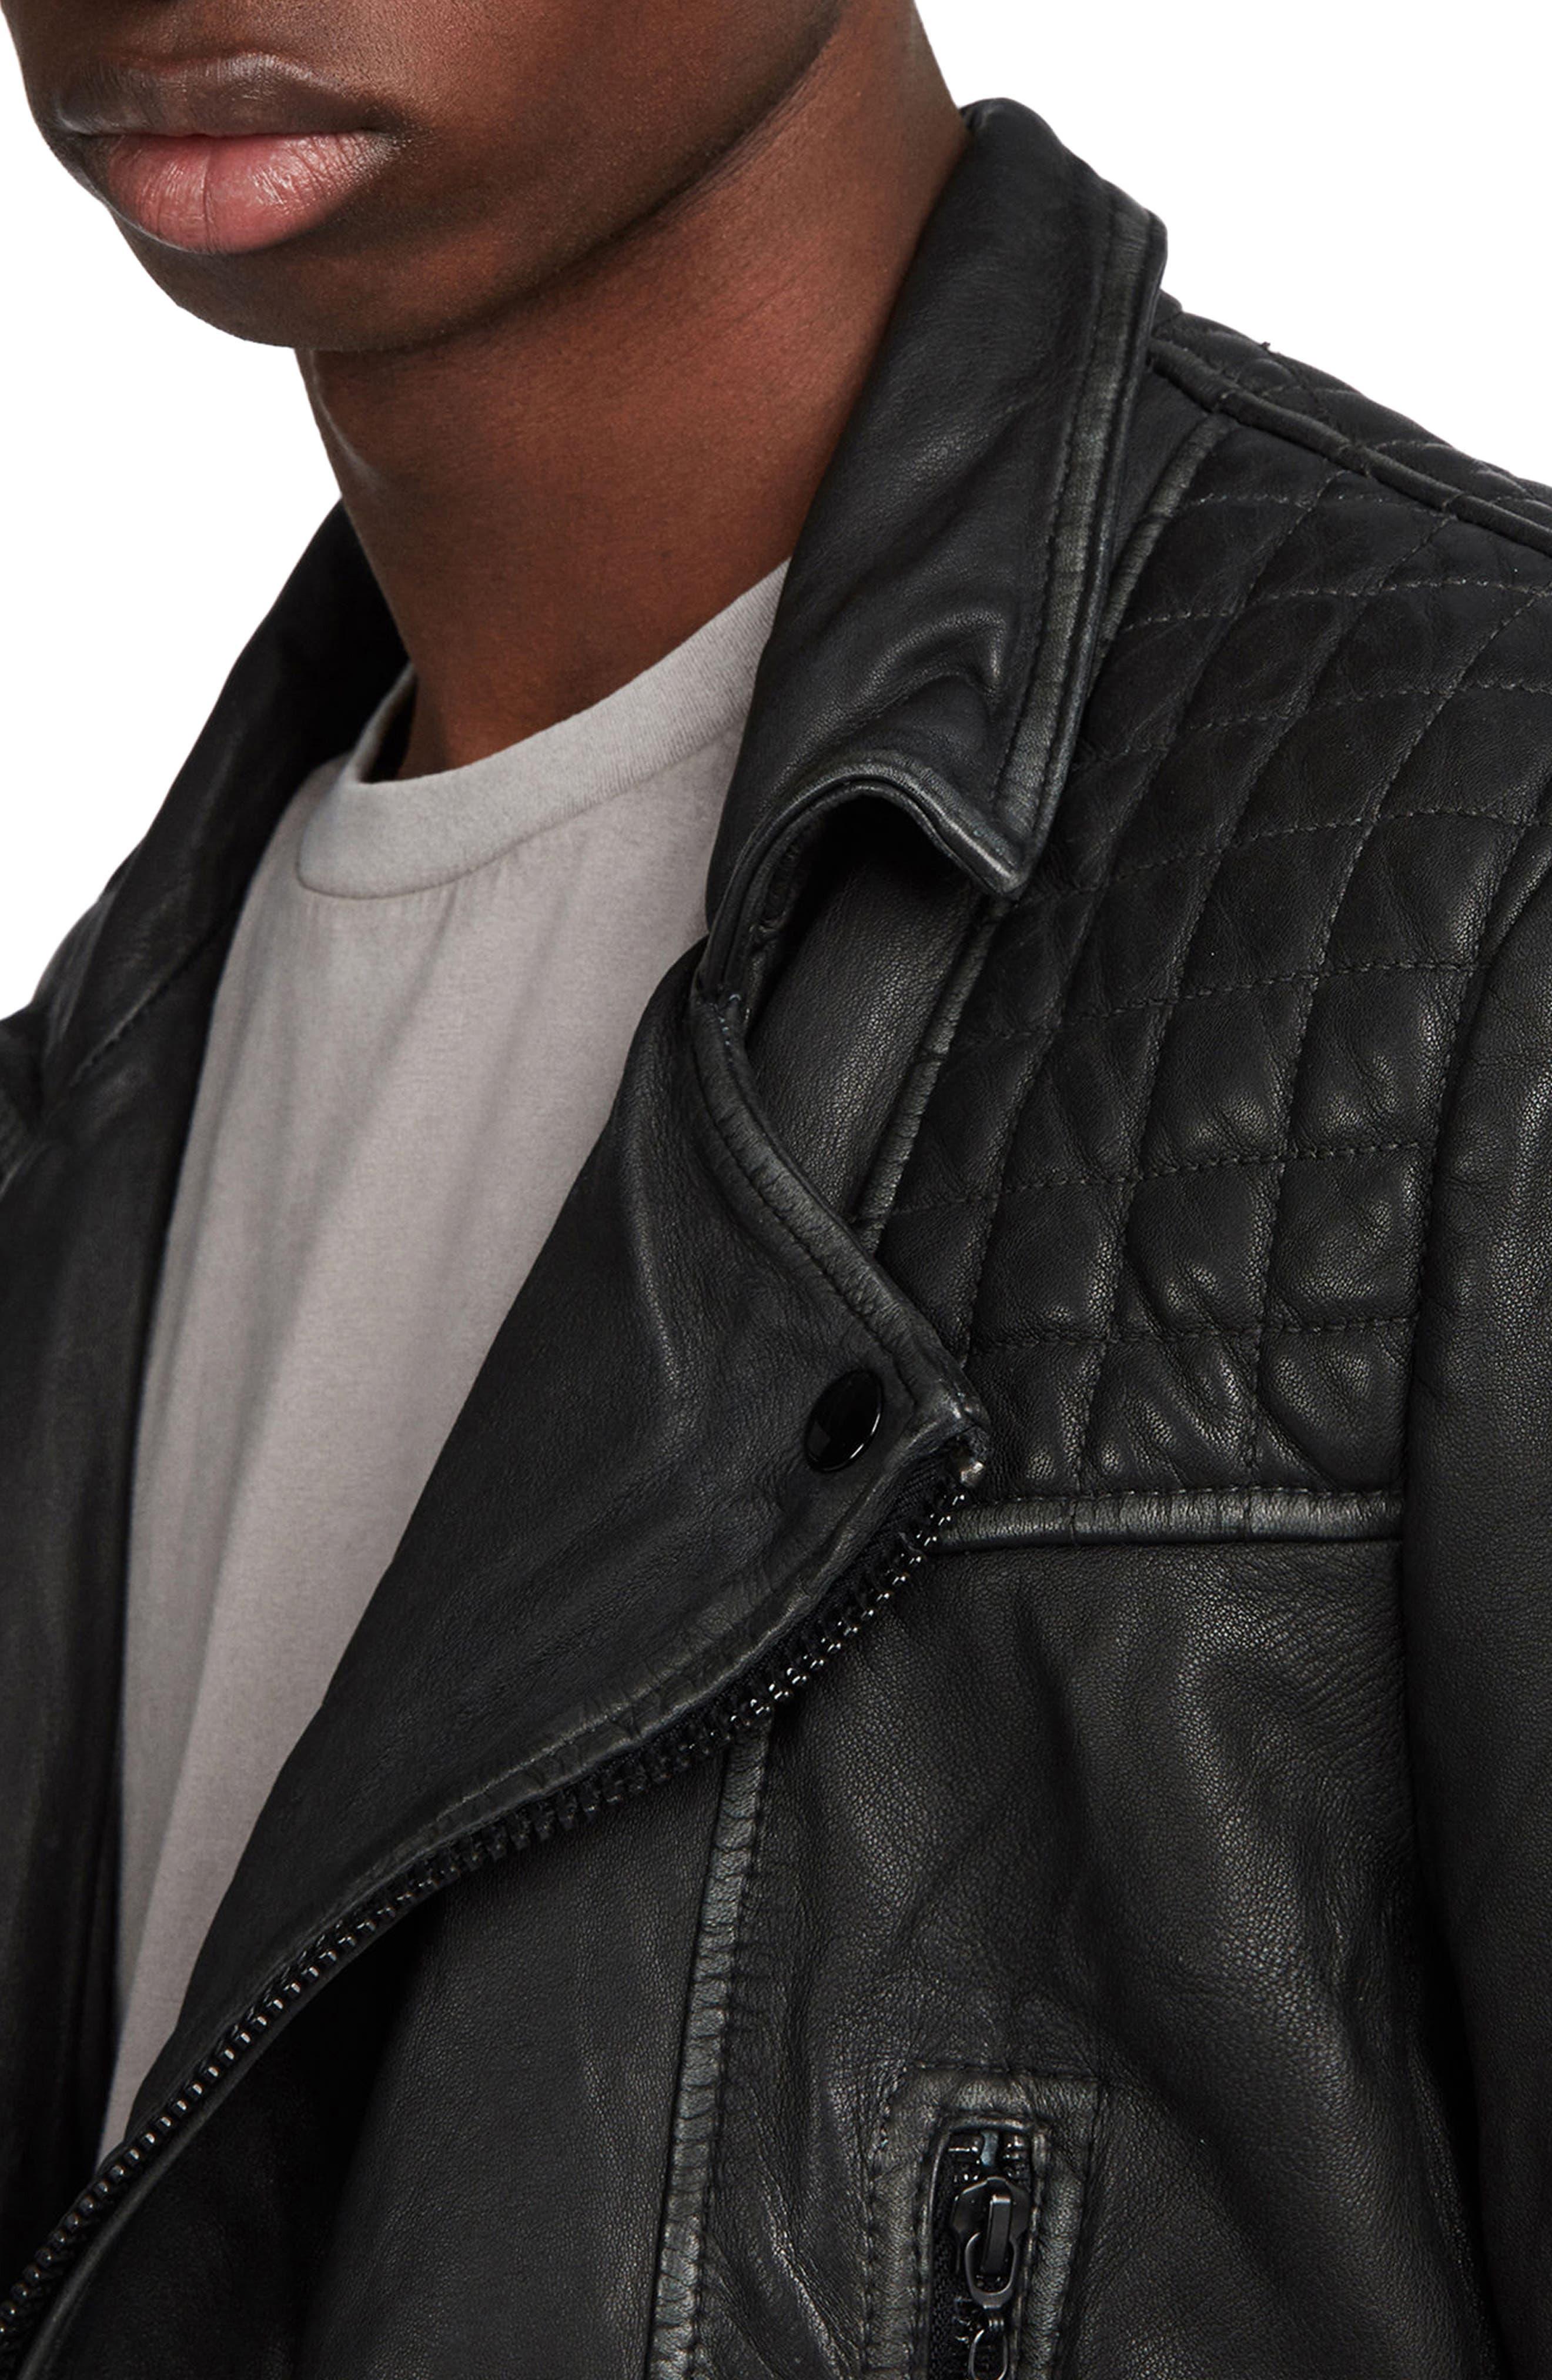 ALLSAINTS, Cargo Biker Slim Fit Leather Jacket, Alternate thumbnail 4, color, BLACK GREY